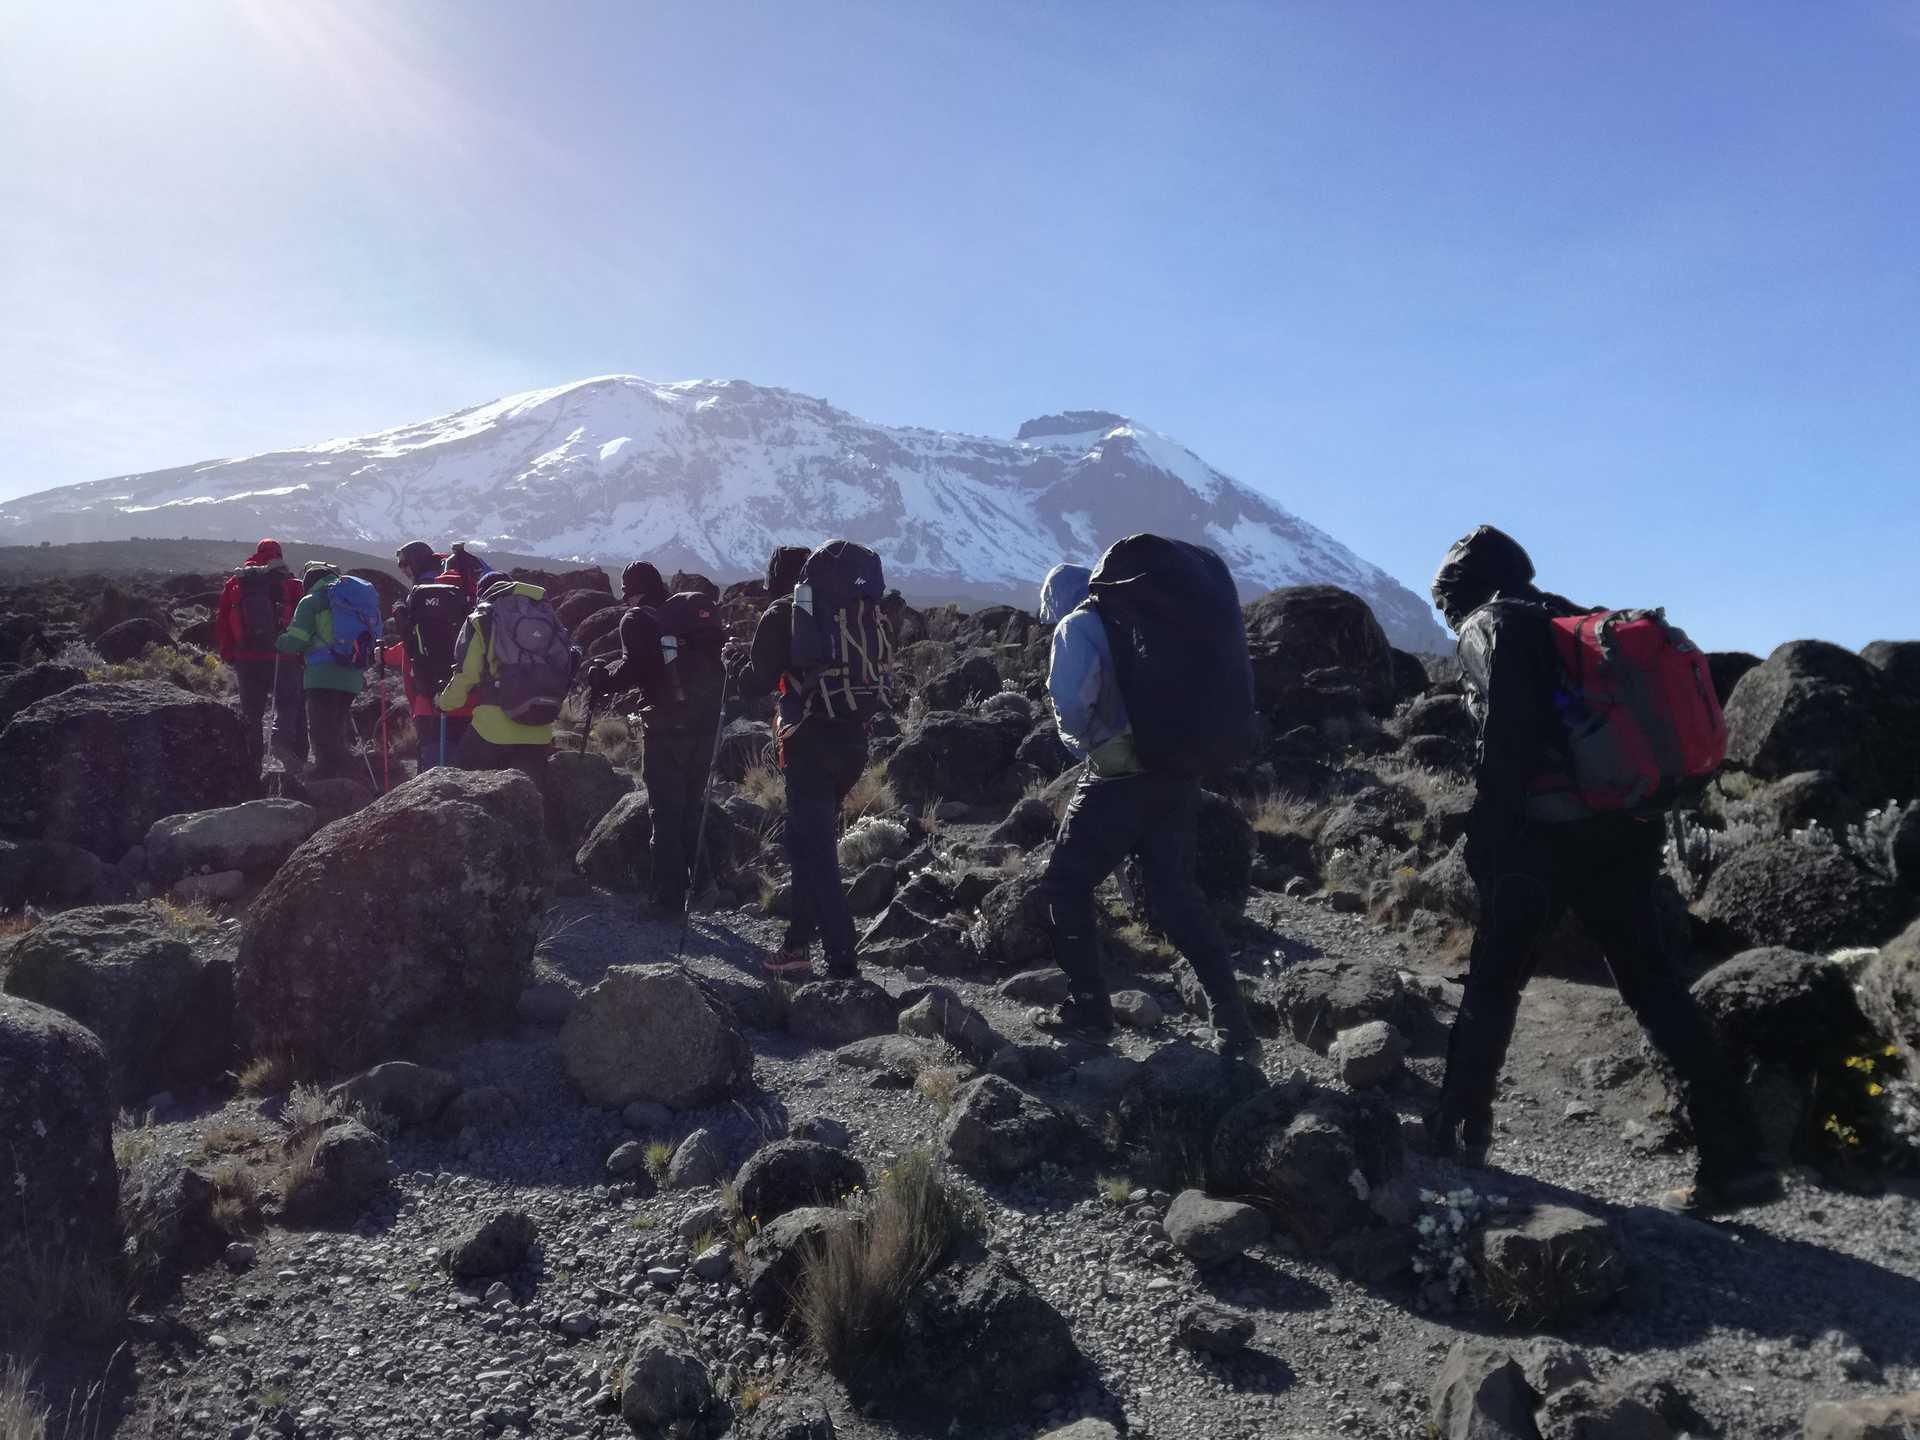 Hikers climbing Mount Kilimanjaro